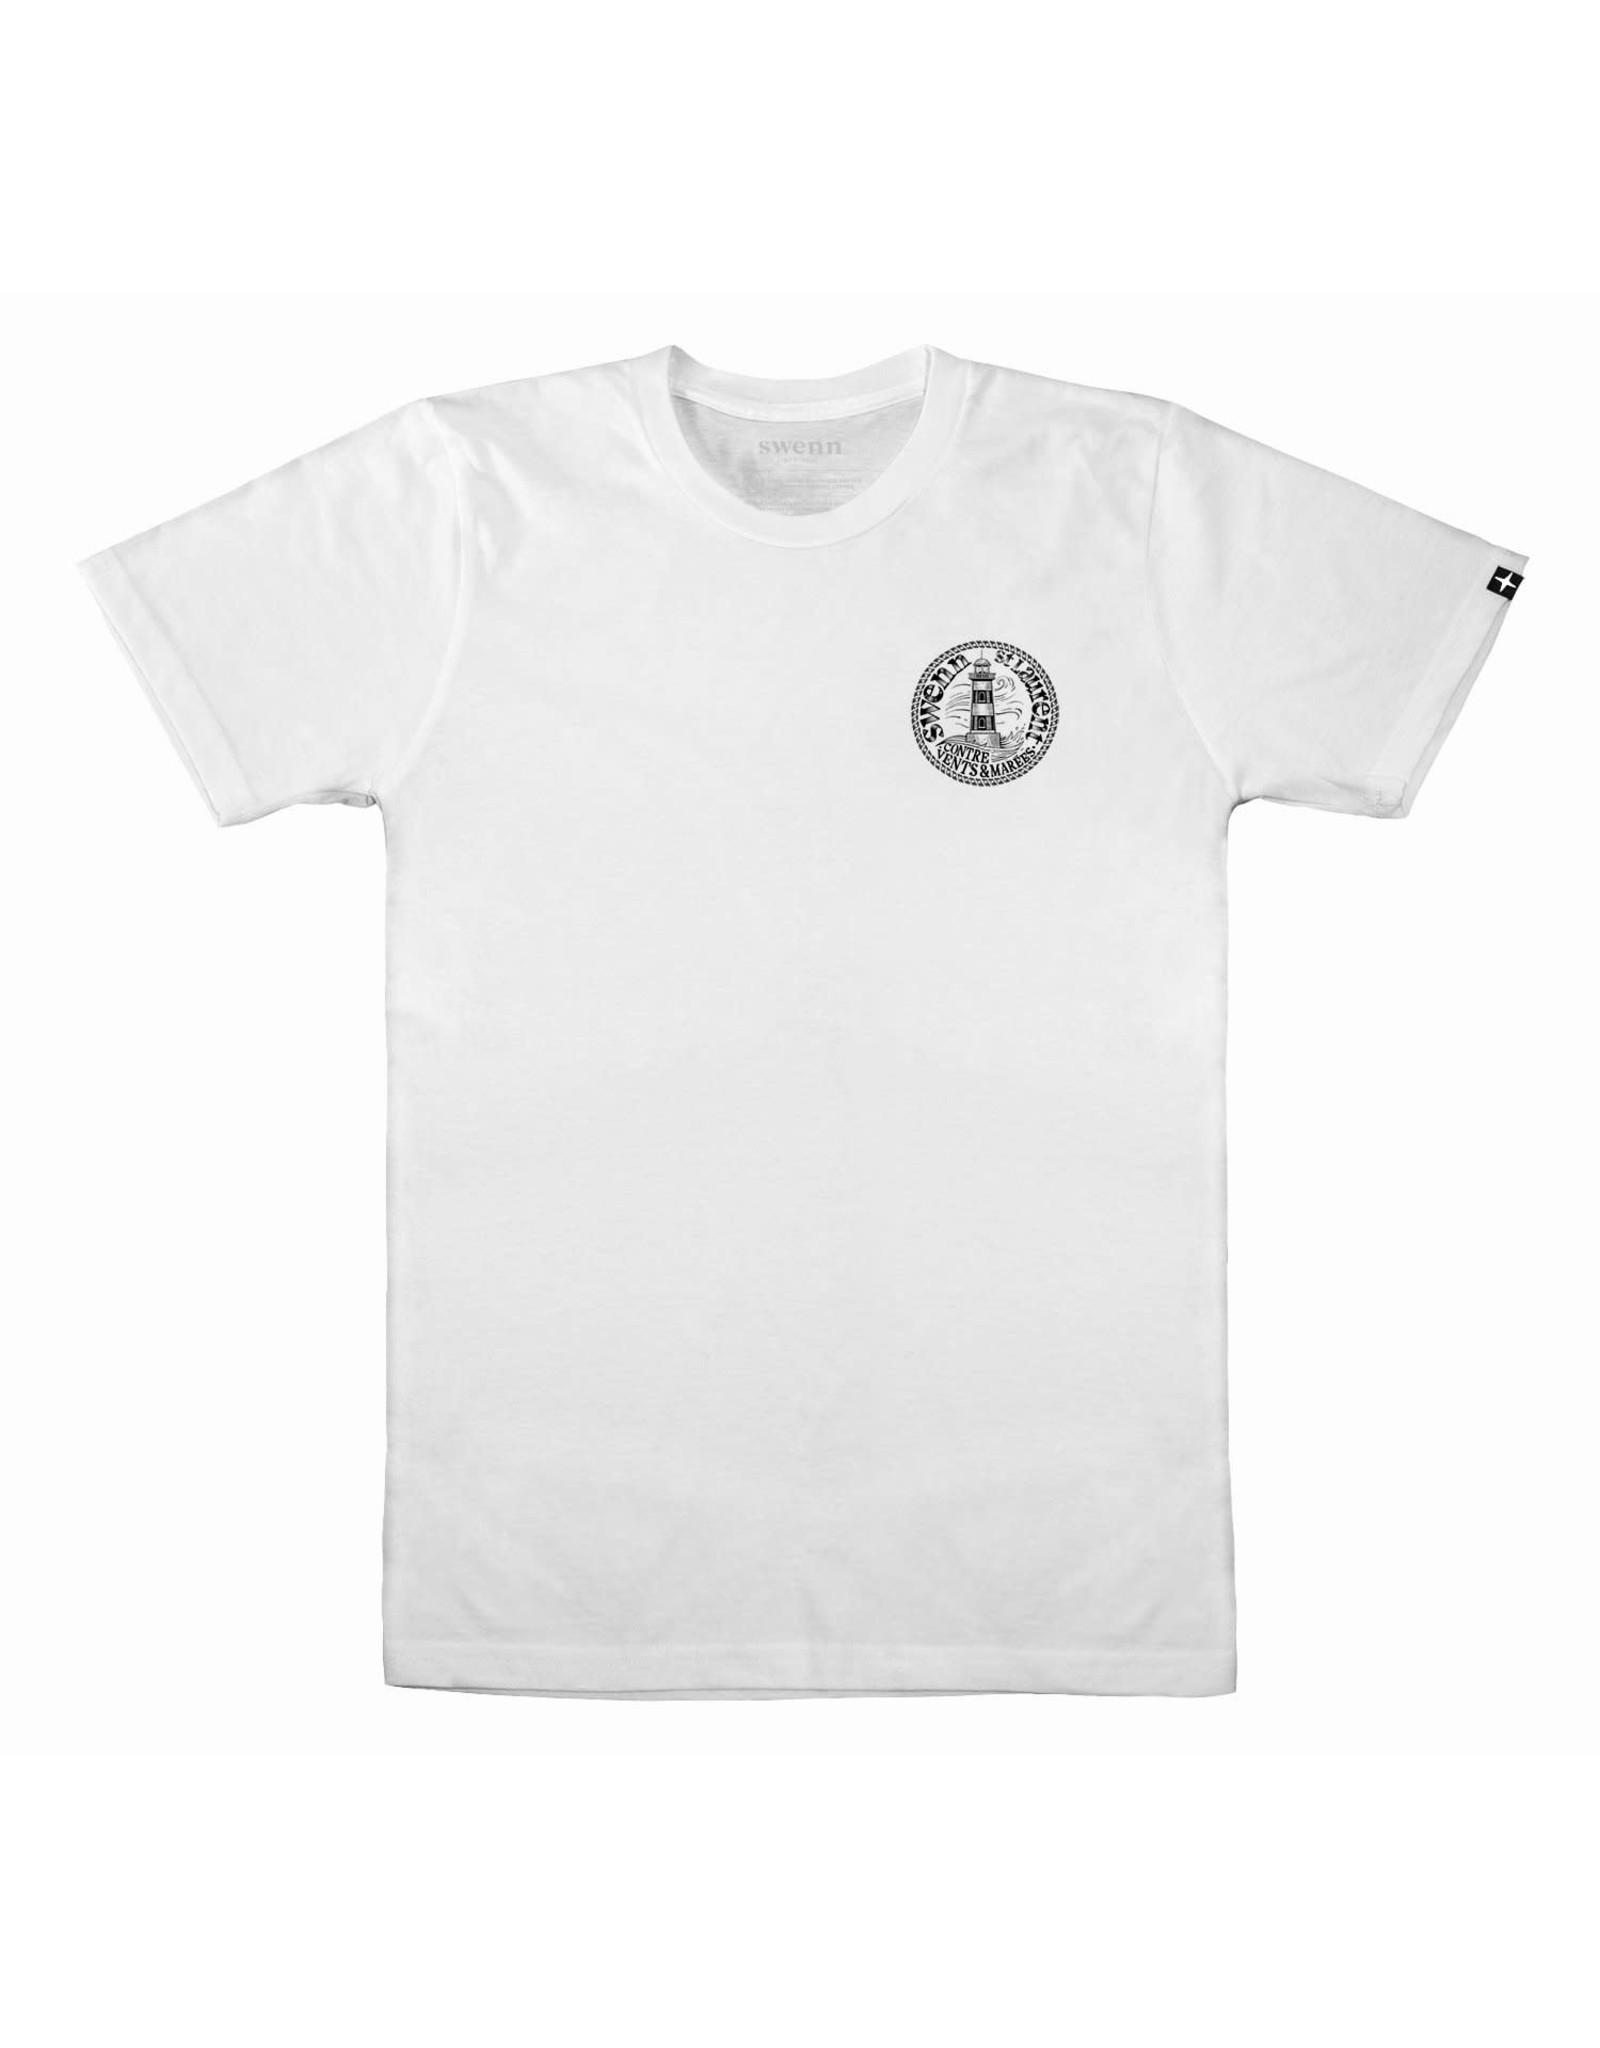 Swenn T-shirt unisexe Phare - Blanc